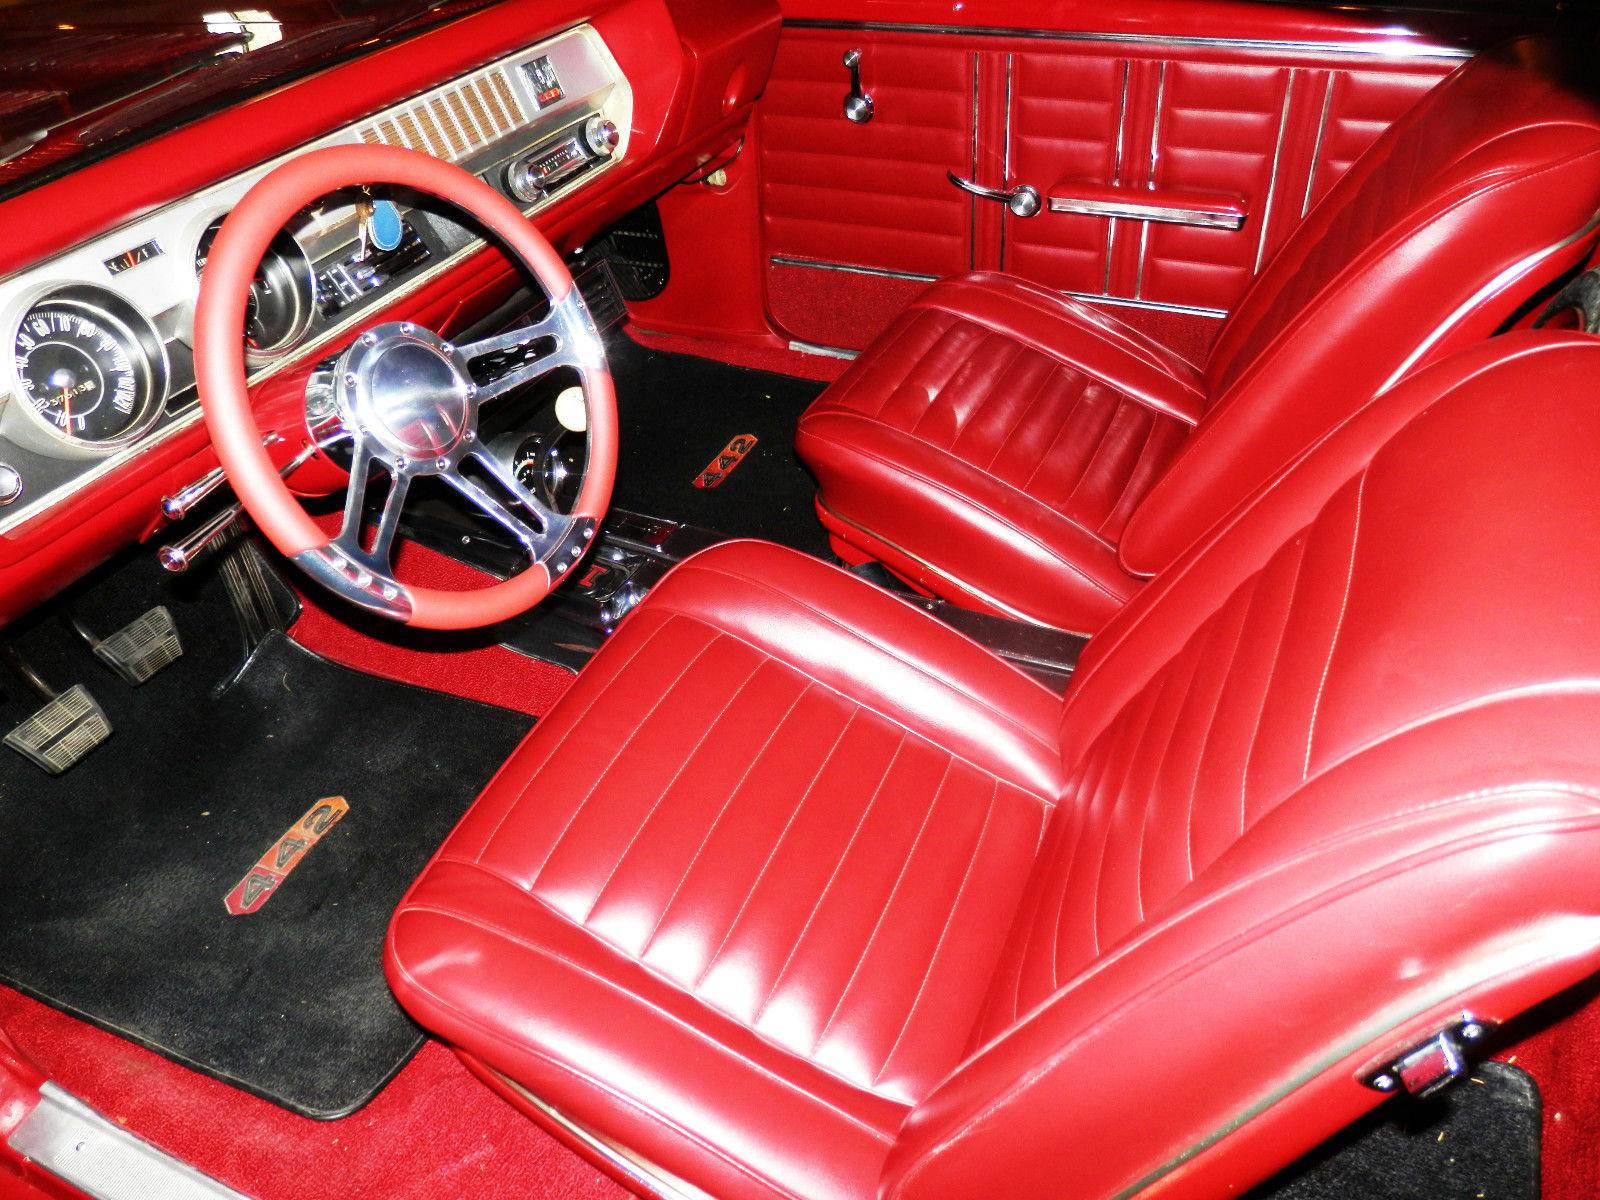 BangShift com Olds Camino: This 1967 Oldsmobile Cutlass Had